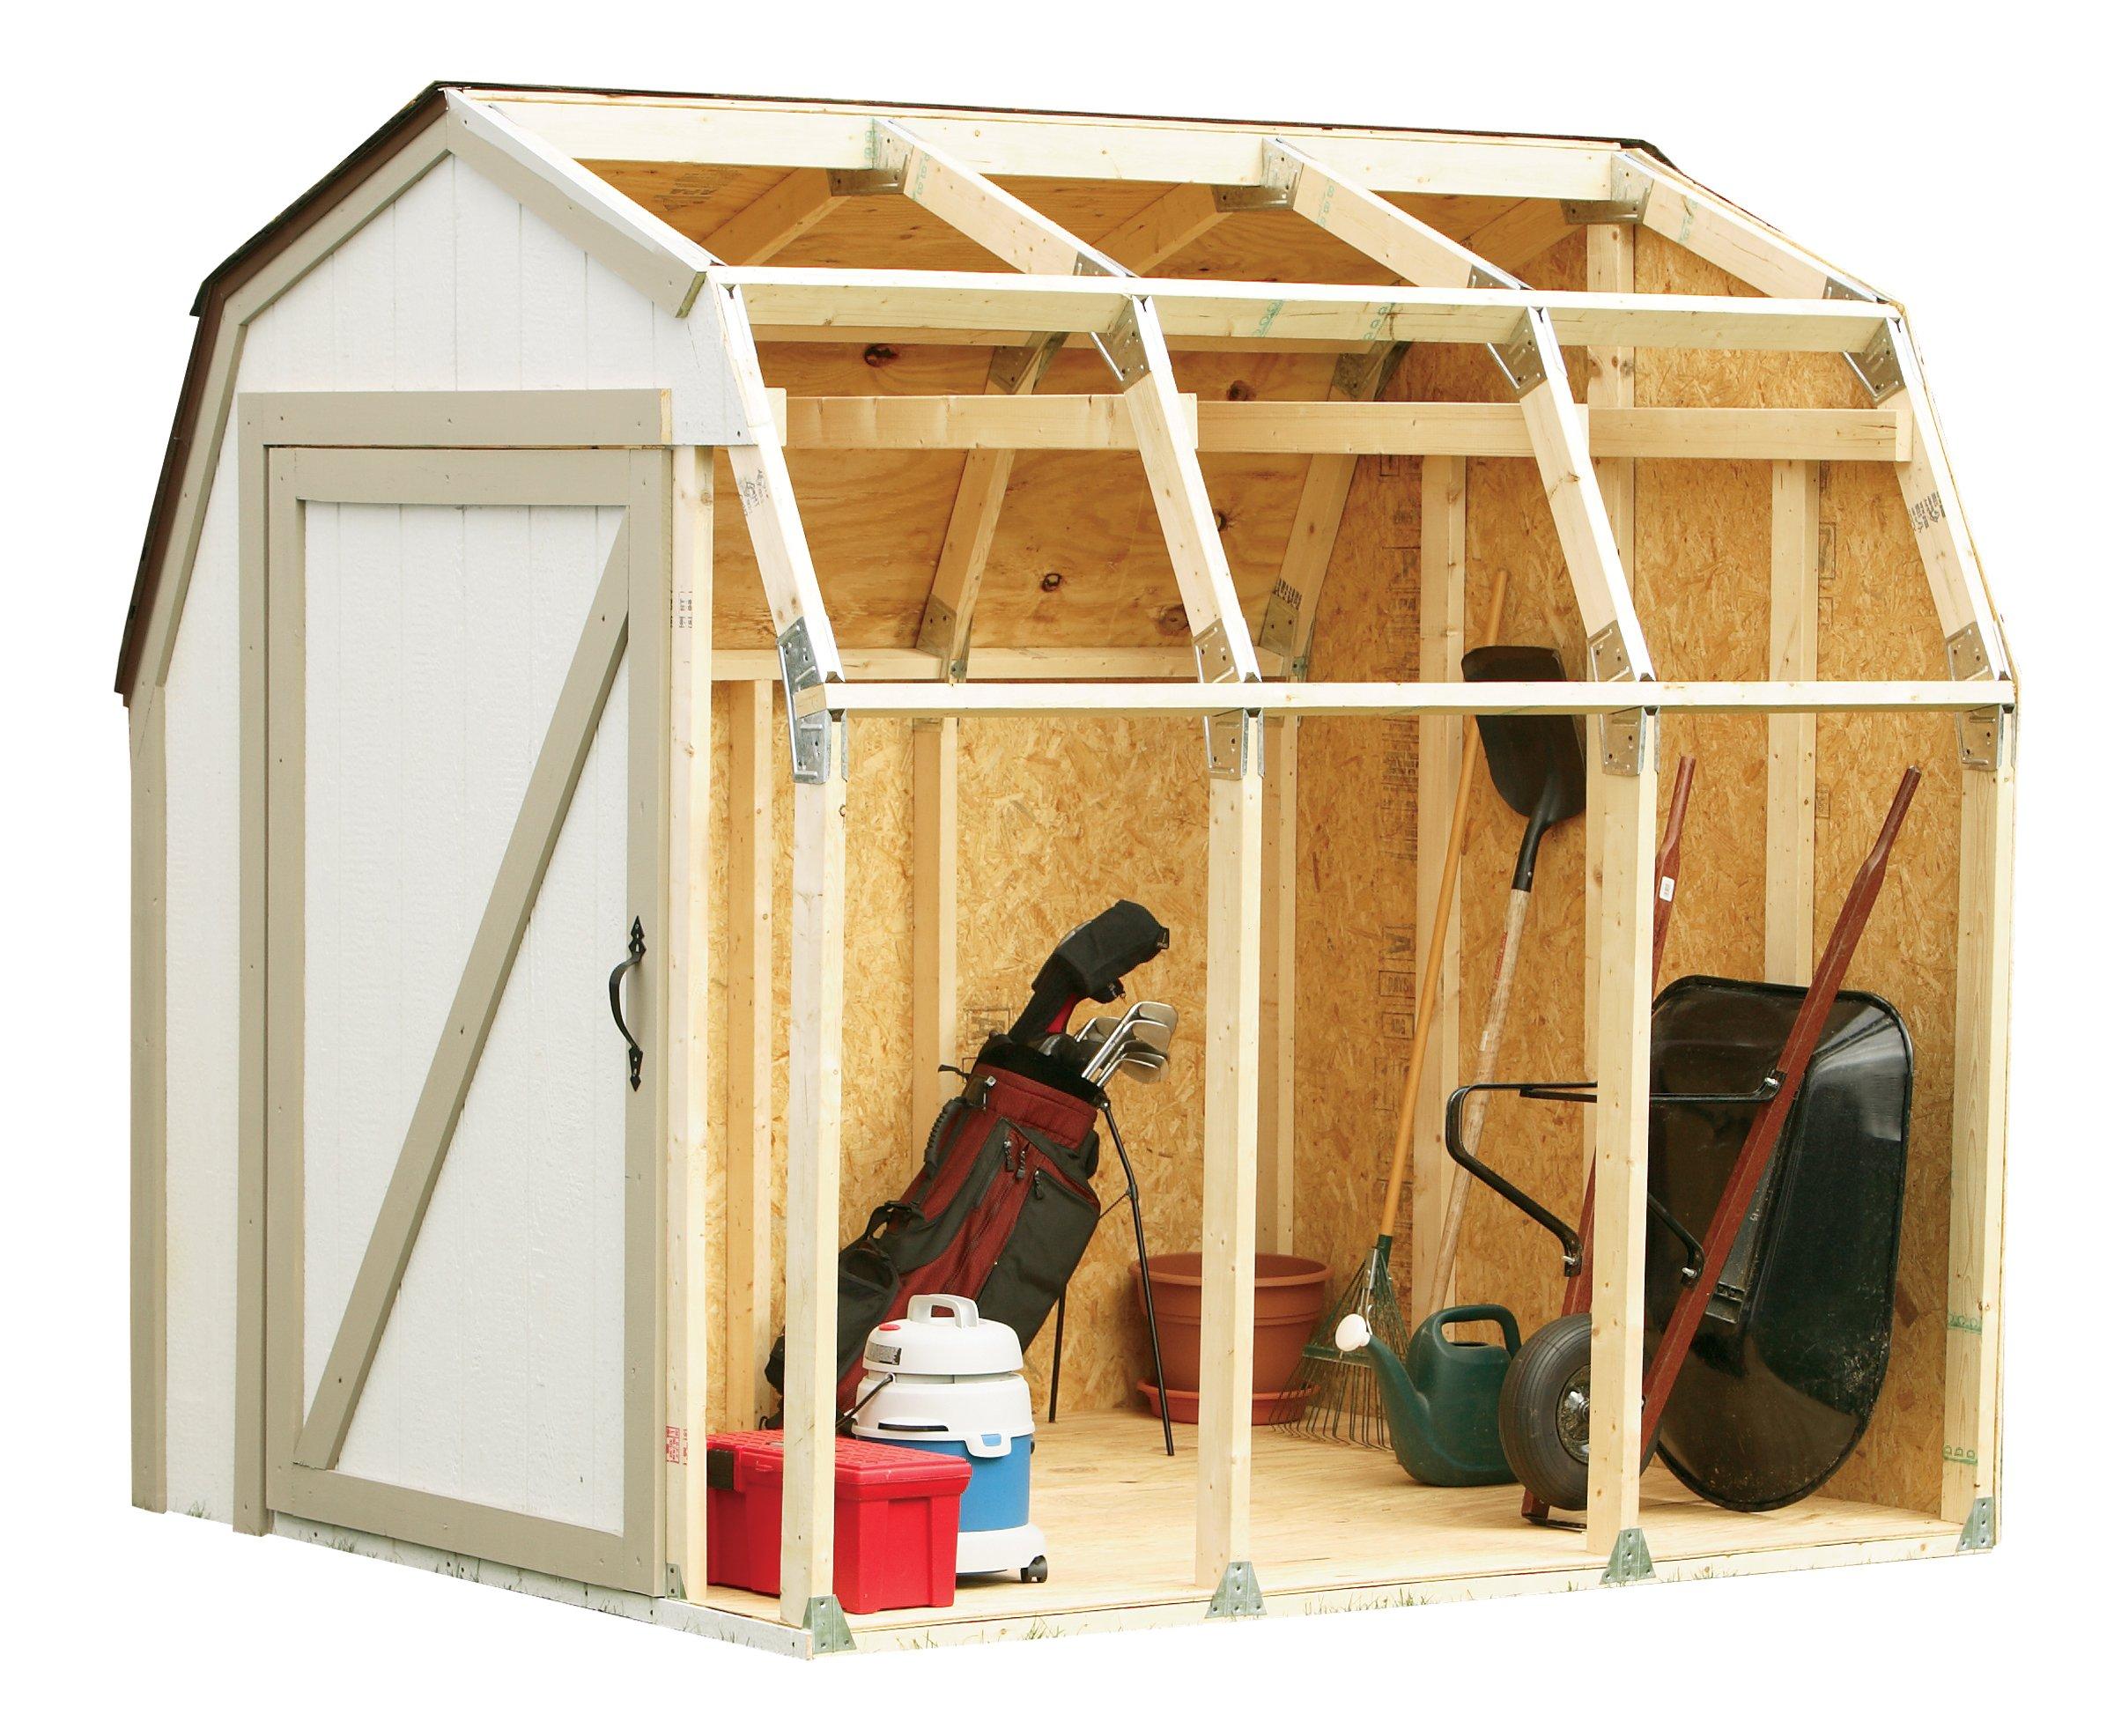 2x4basics 90190MI Custom Shed Kit with Barn Roof by 2x4 basics